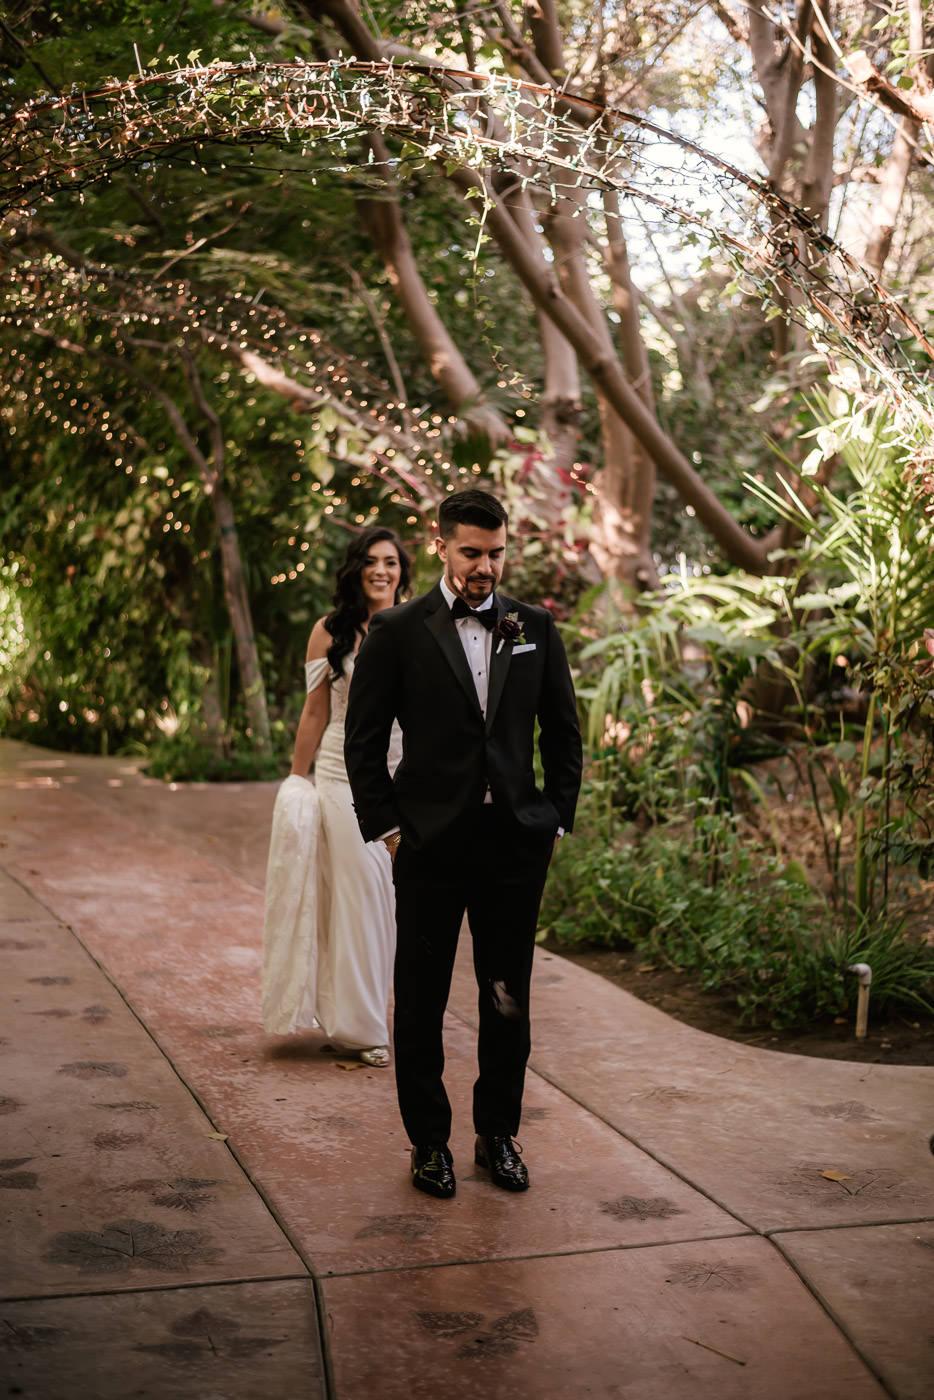 eden-gardens-wedding-photographer-romantic-23.jpg